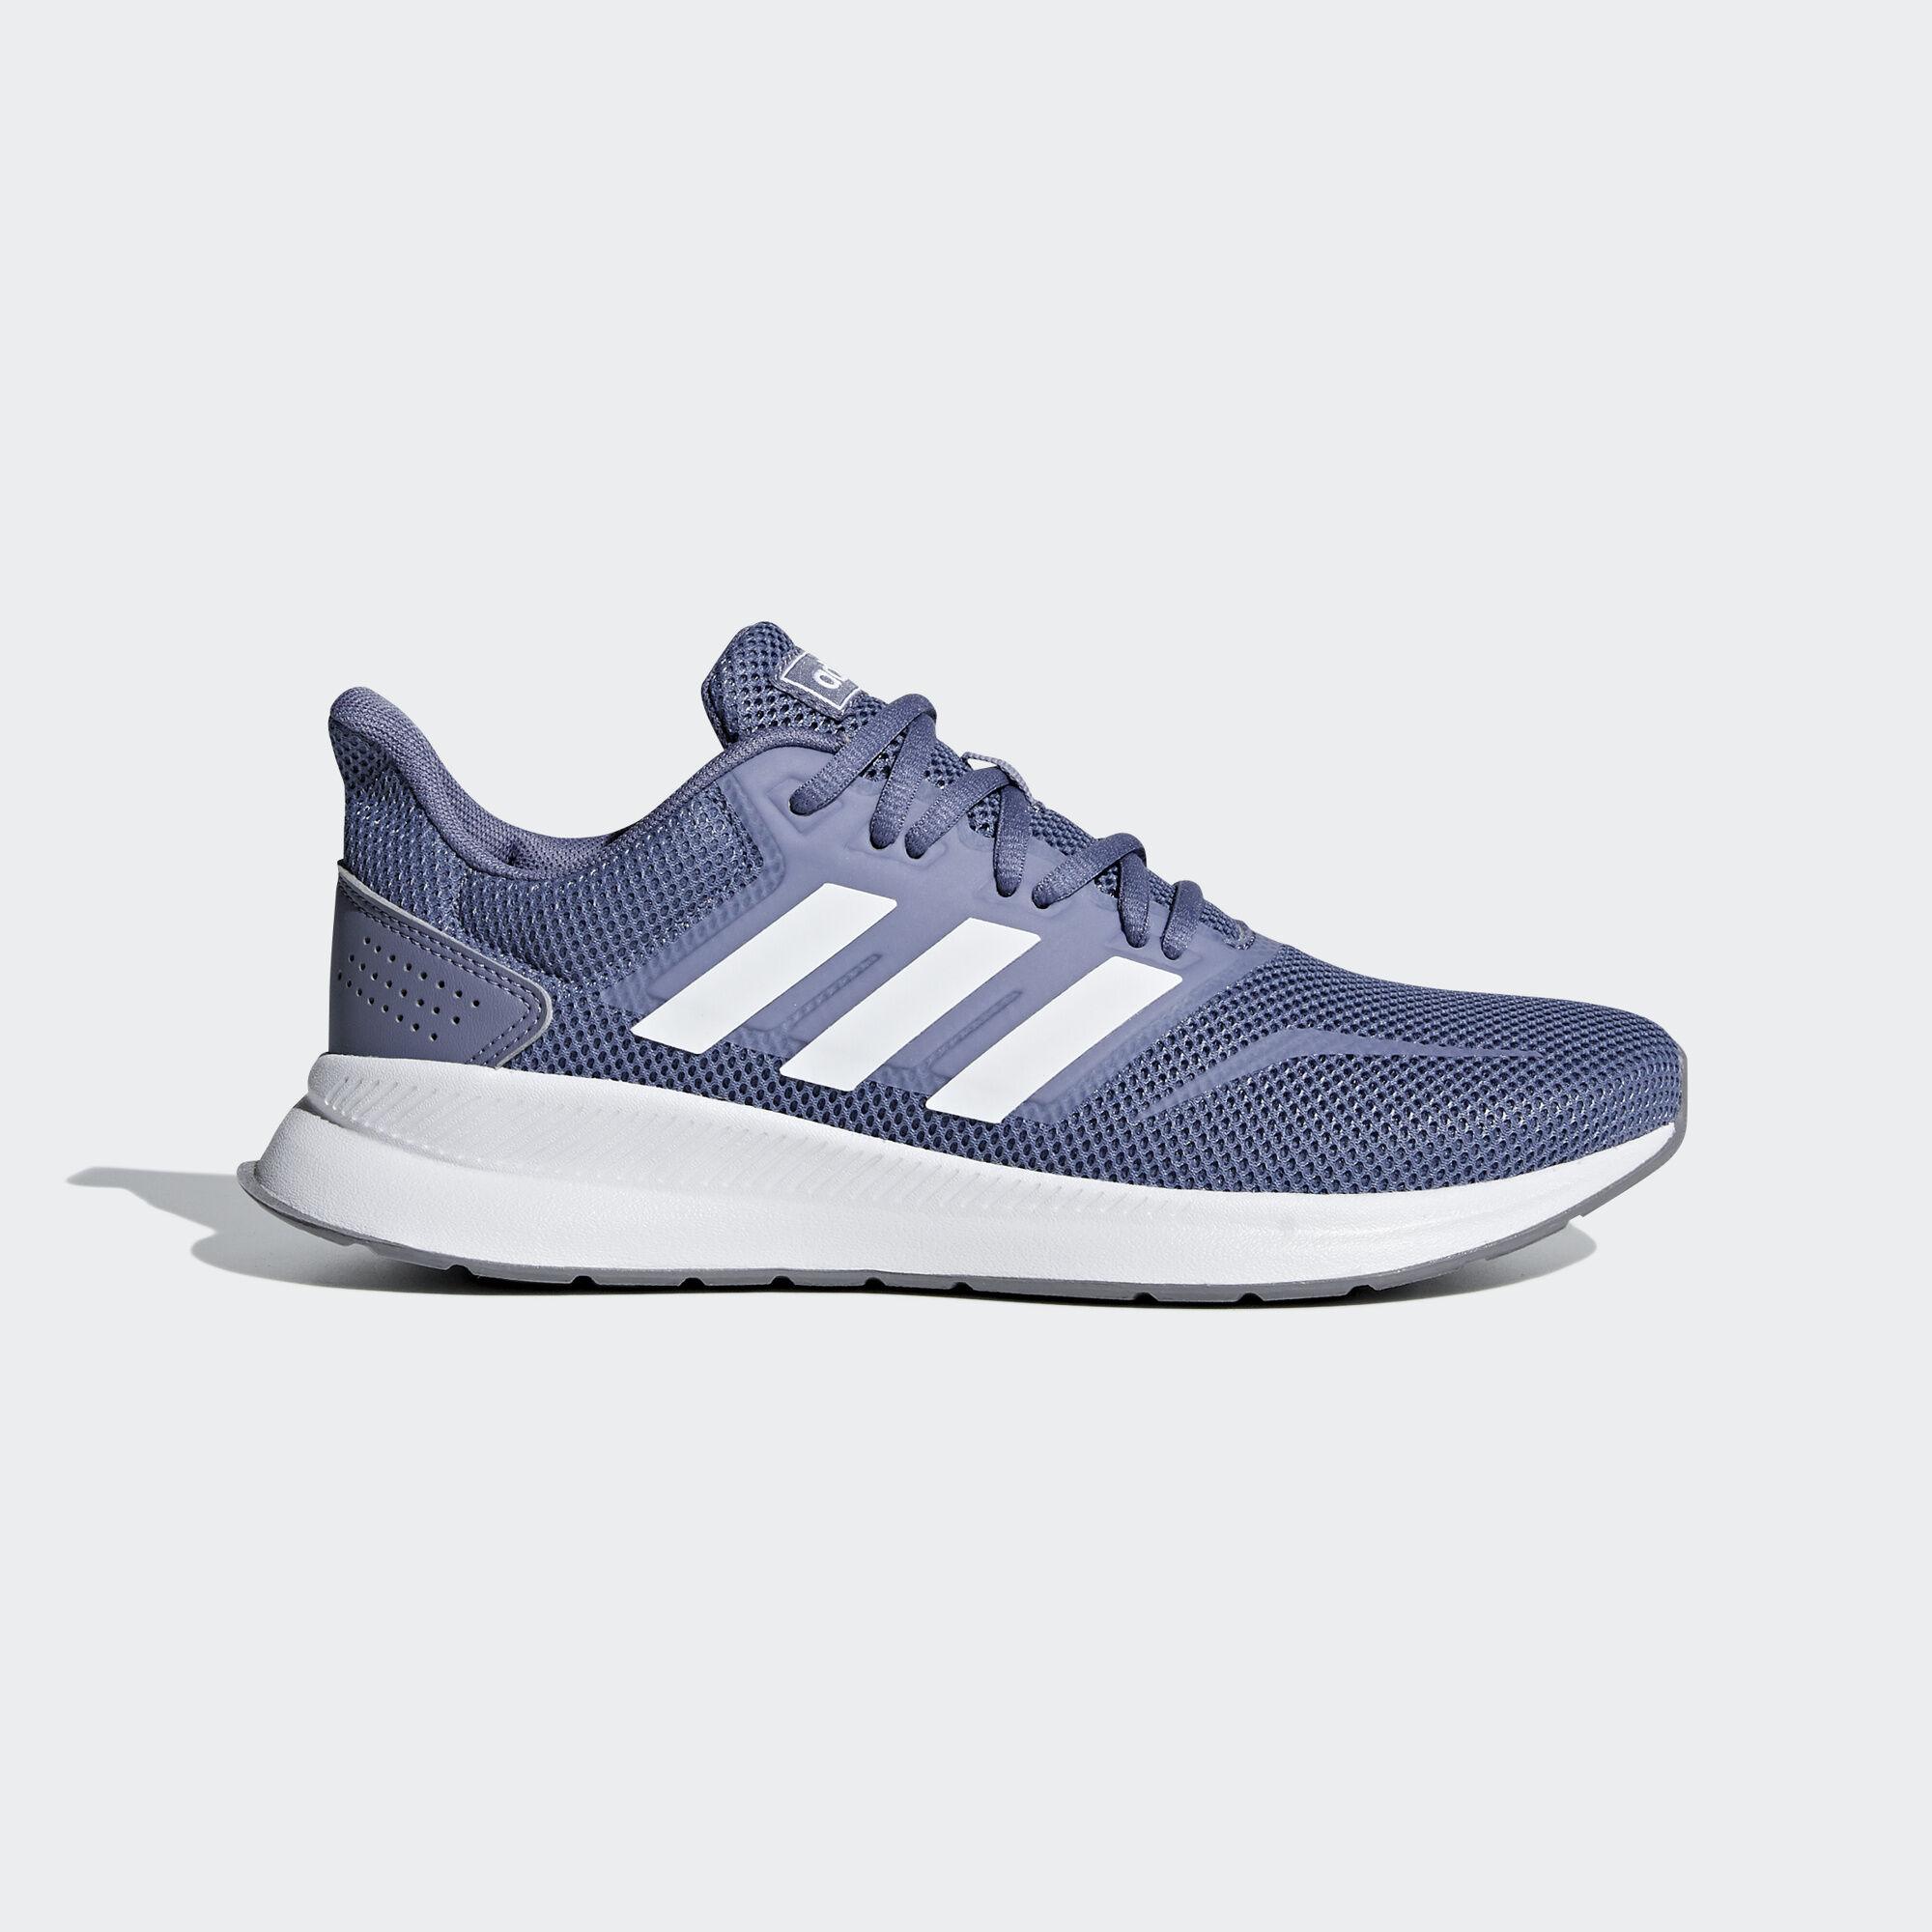 sneakers for cheap 2de5a 9205c adidas - Runfalcon Shoes Raw Indigo  Ftwr White  Grey Three F36217. Women  Essentials